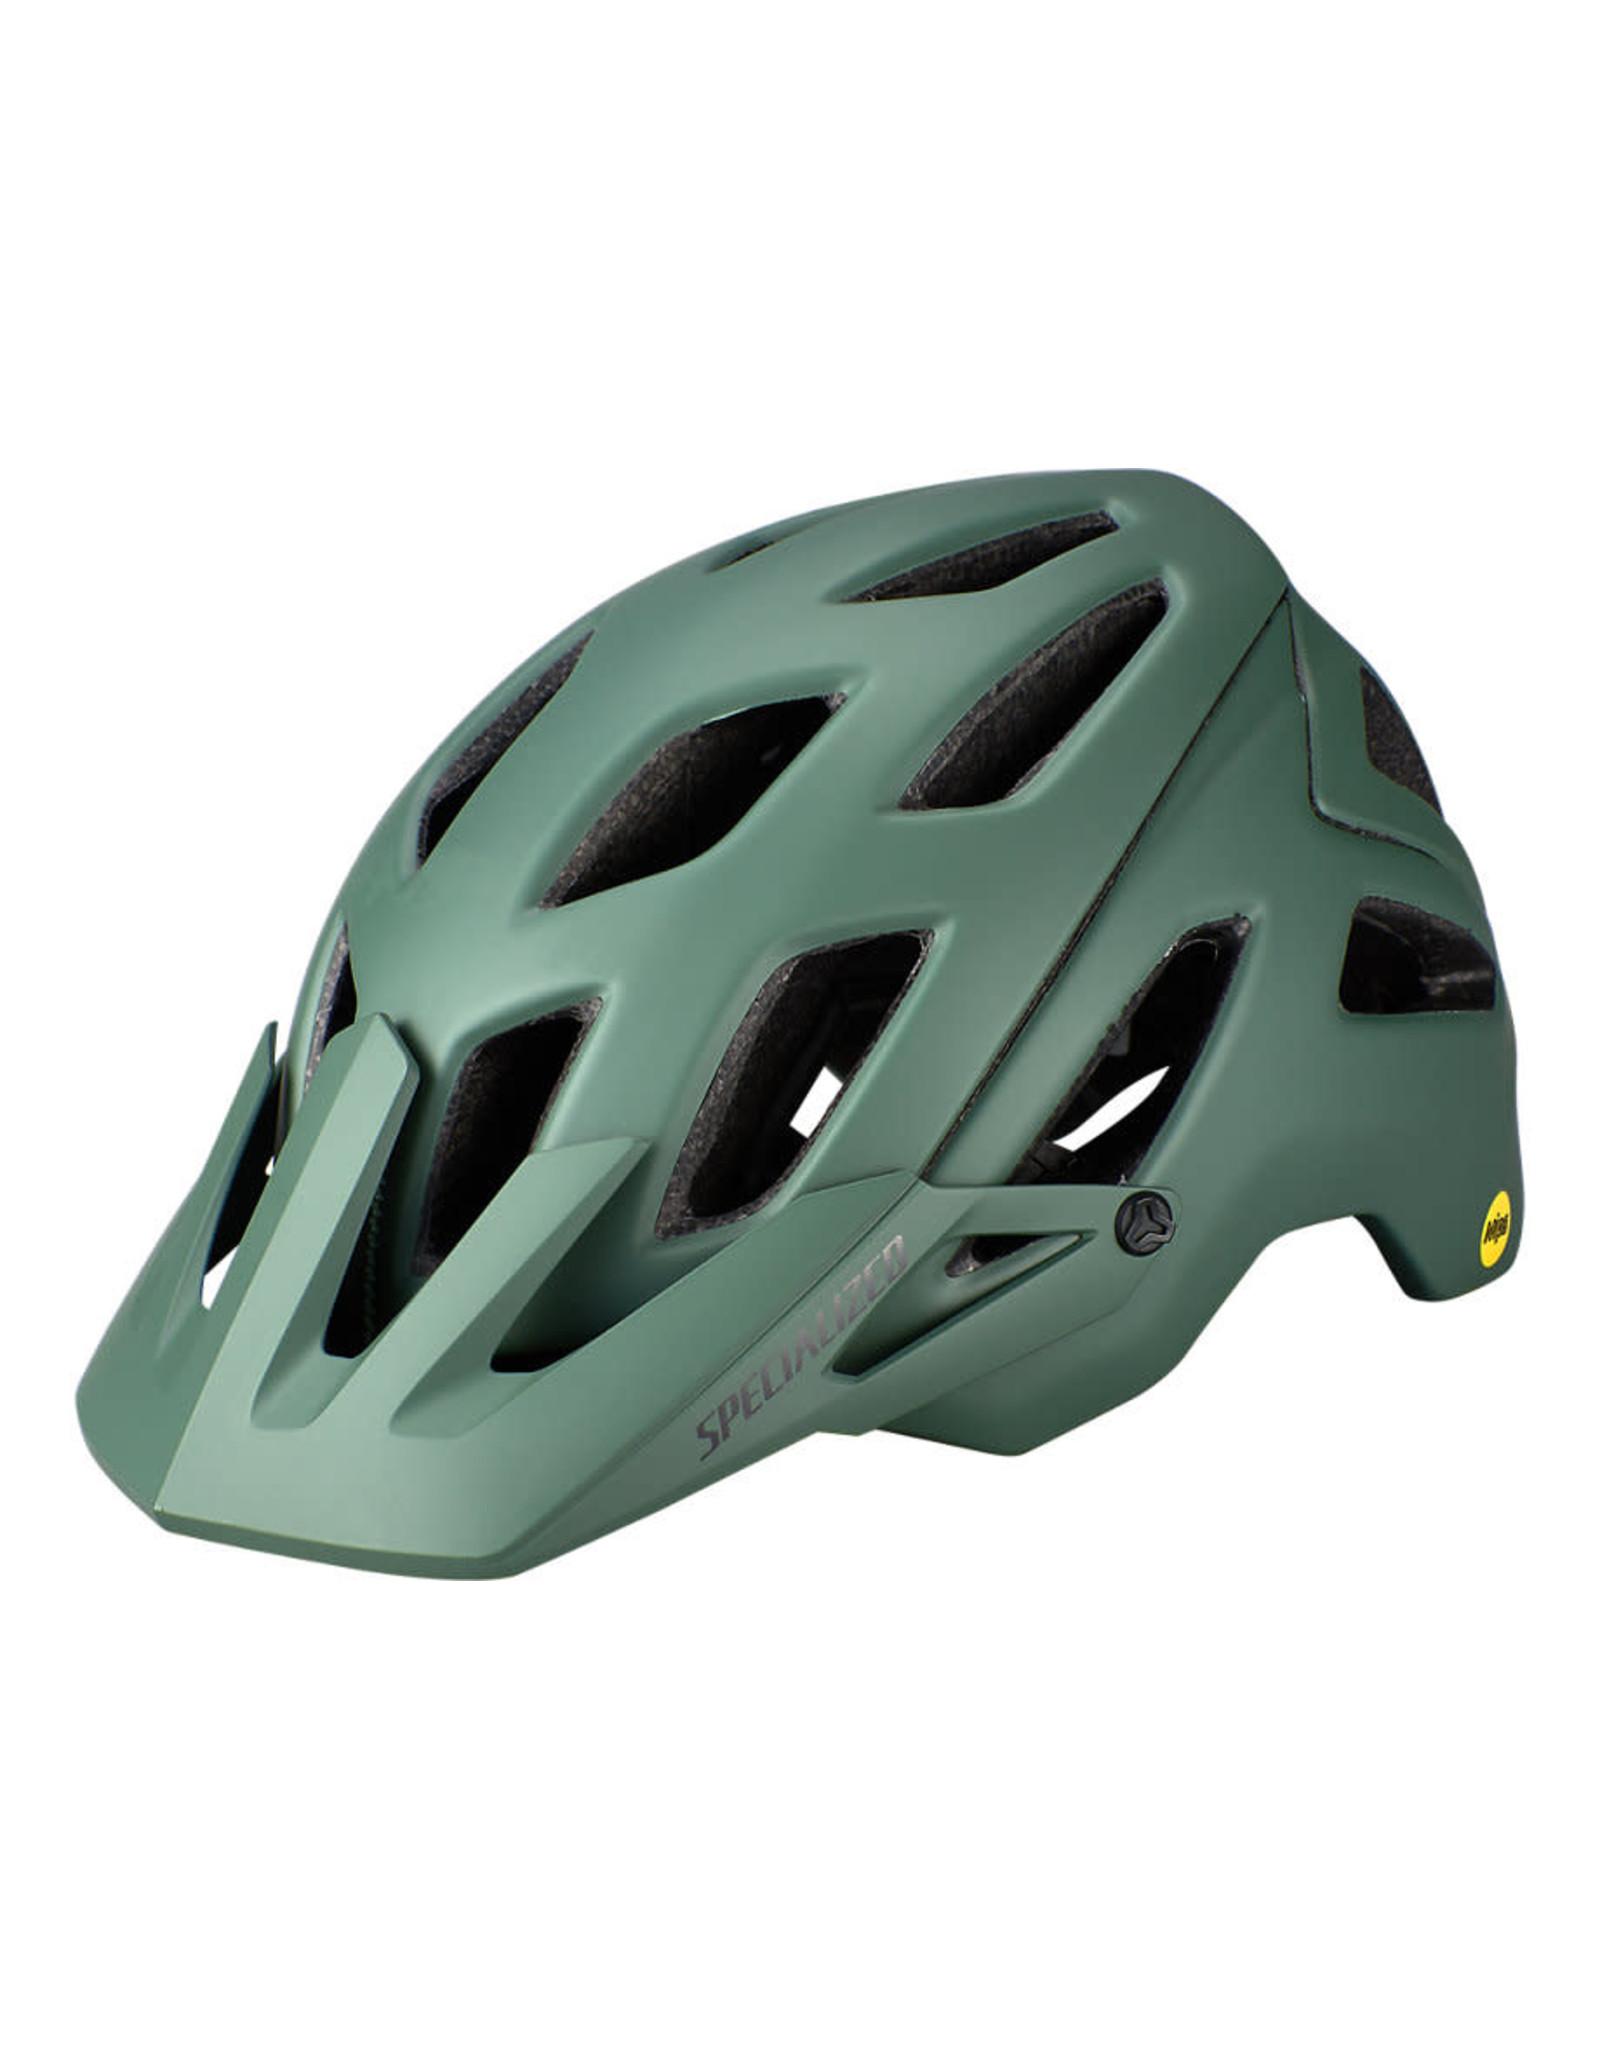 Specialized '20 SPECIALIZED, Ambush Angi, Helmet.